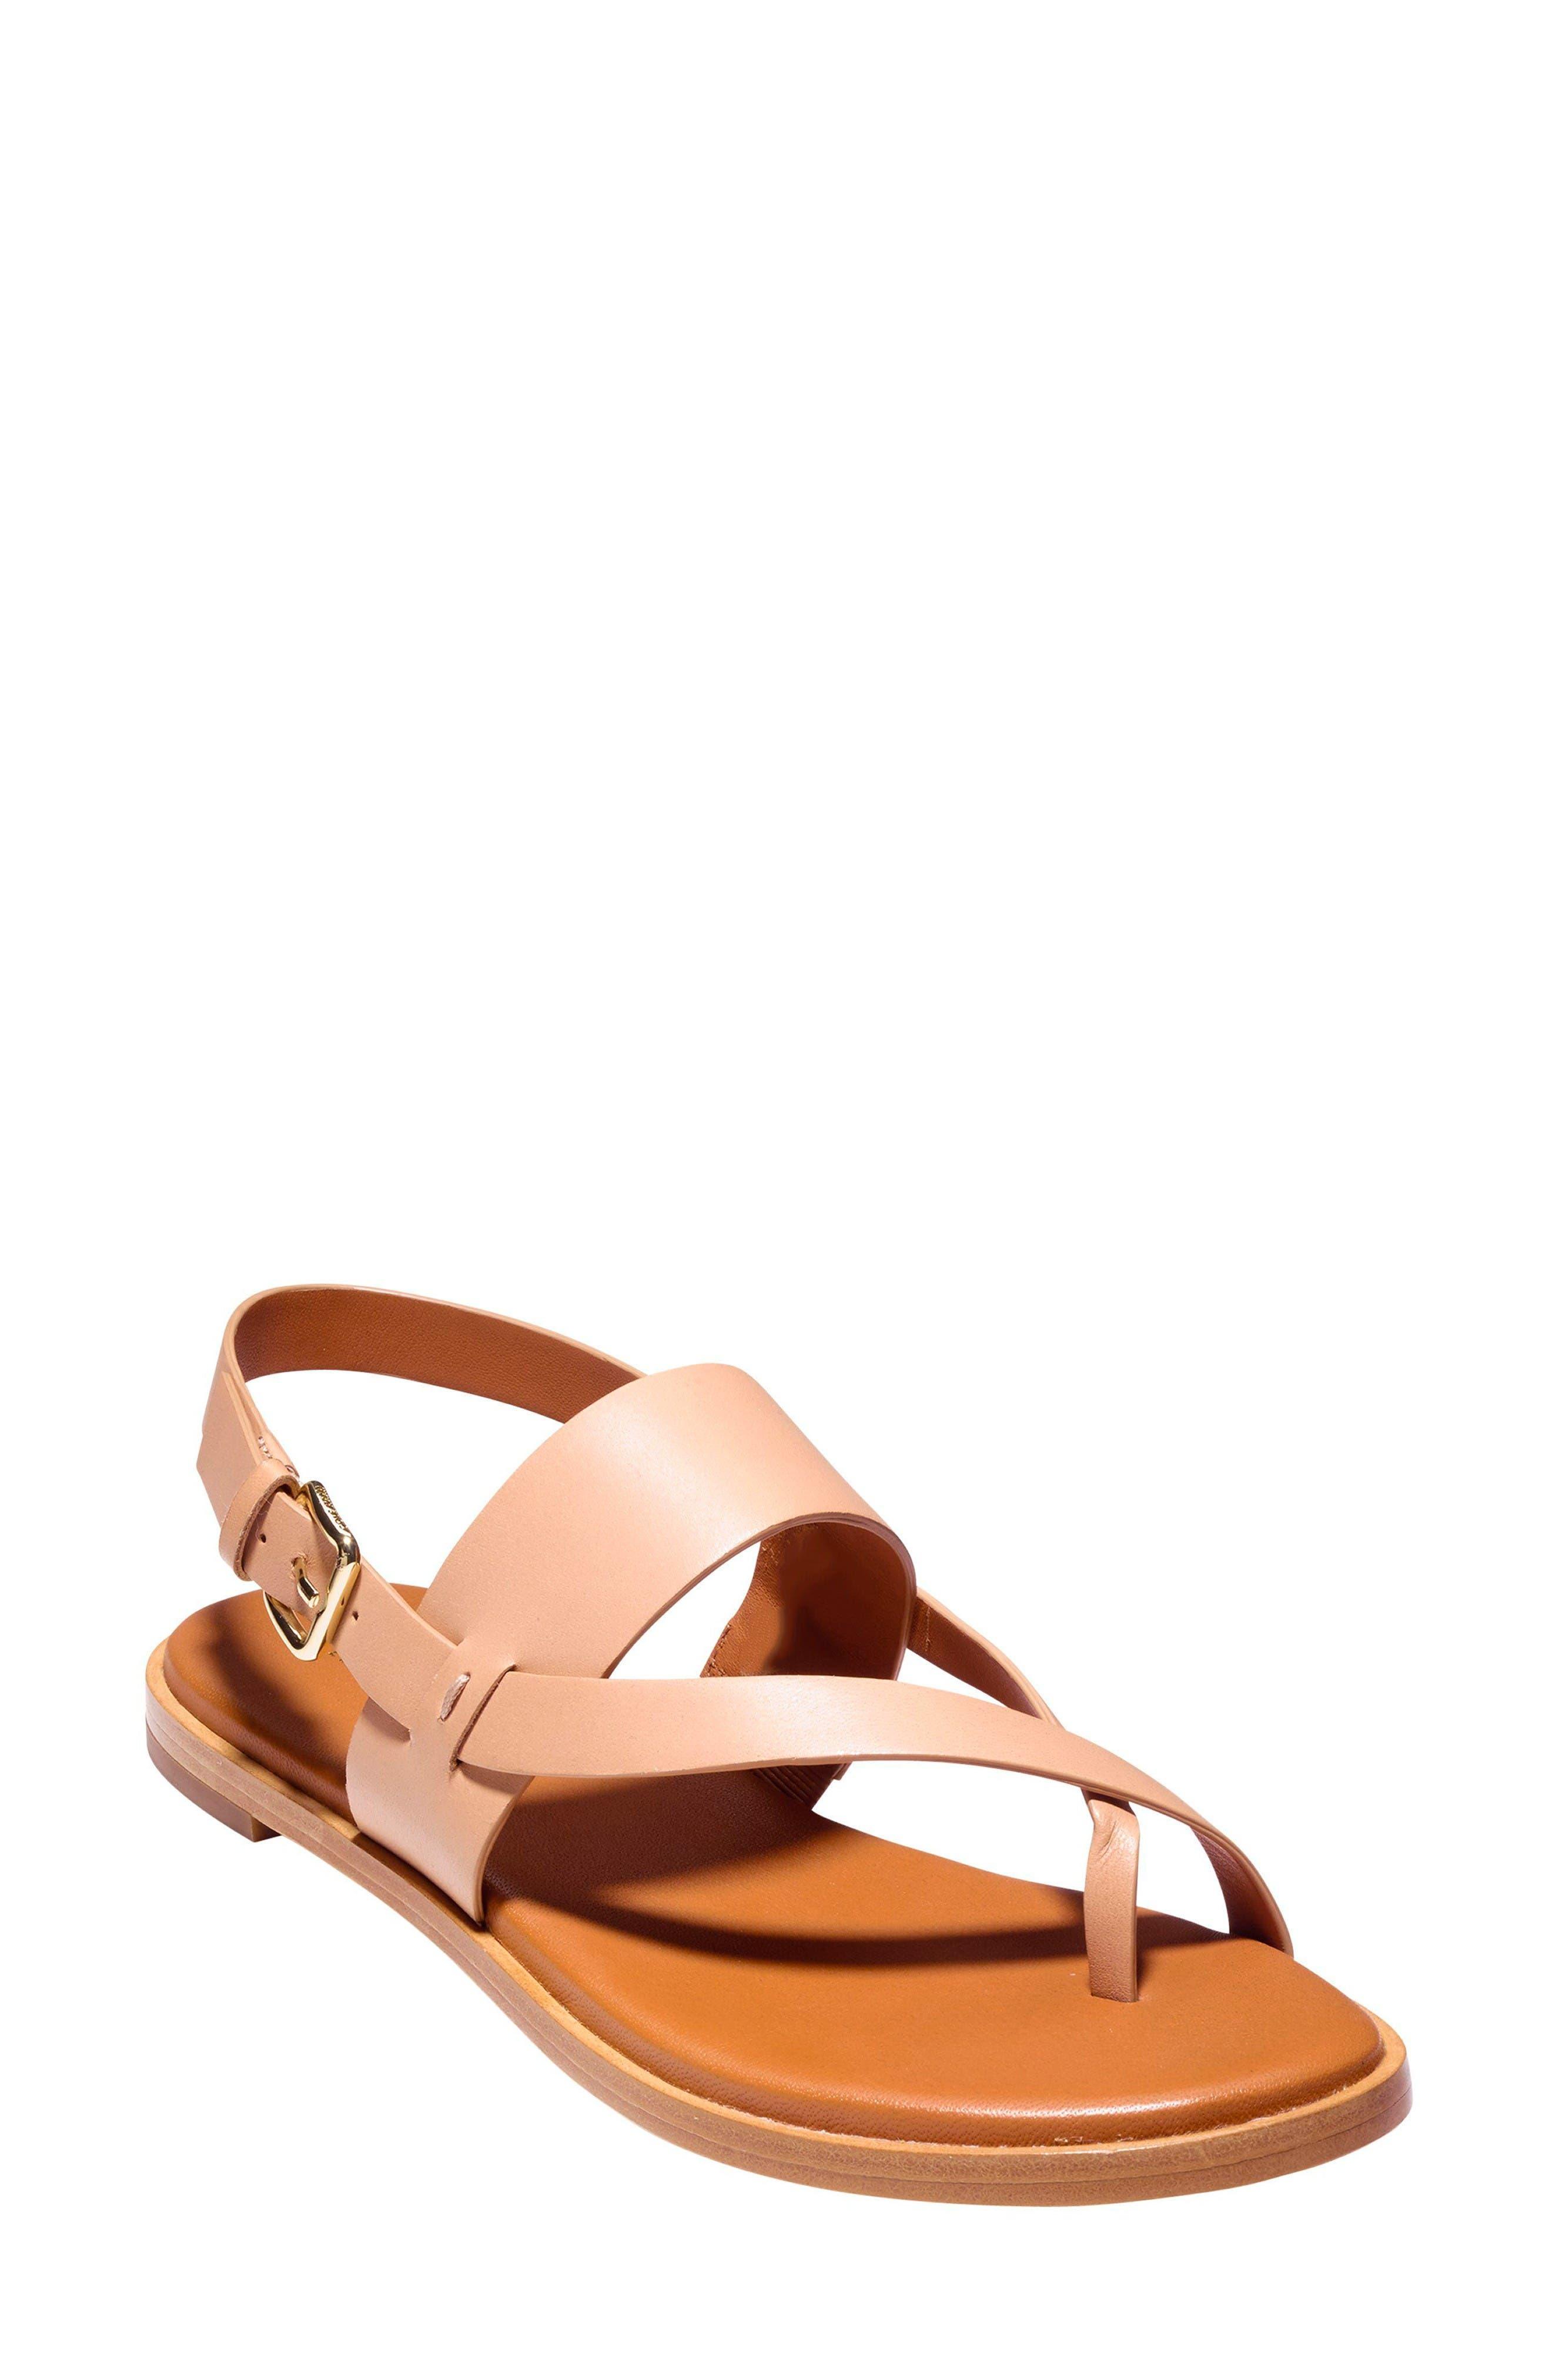 Anica Sandal,                         Main,                         color, Sahara Leather